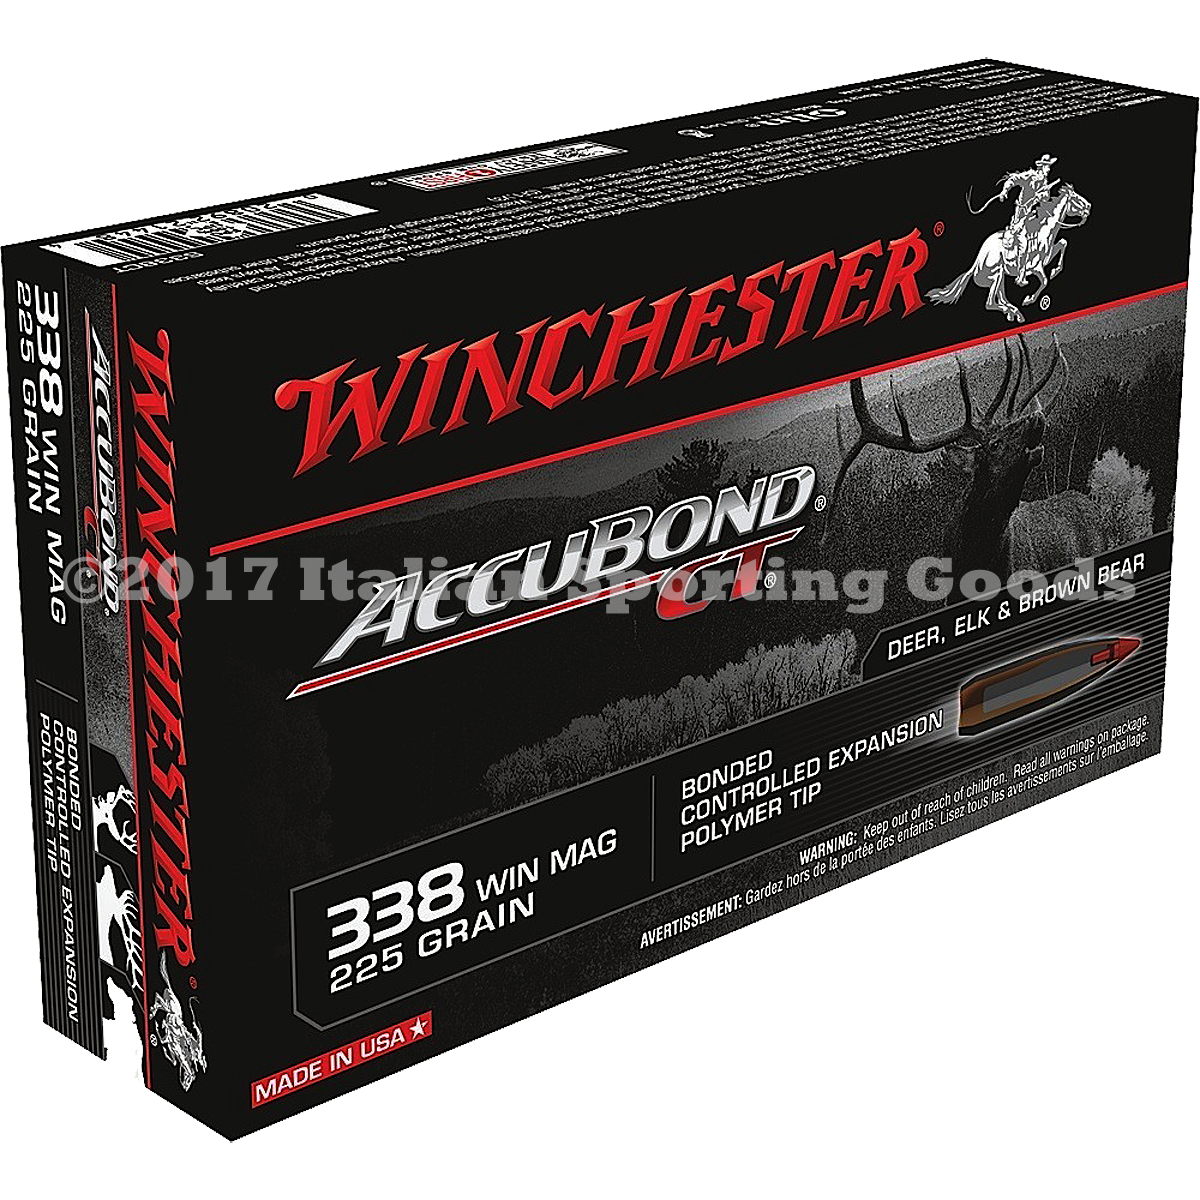 Winchester 338 Win Mag, 225 Gr Accubond